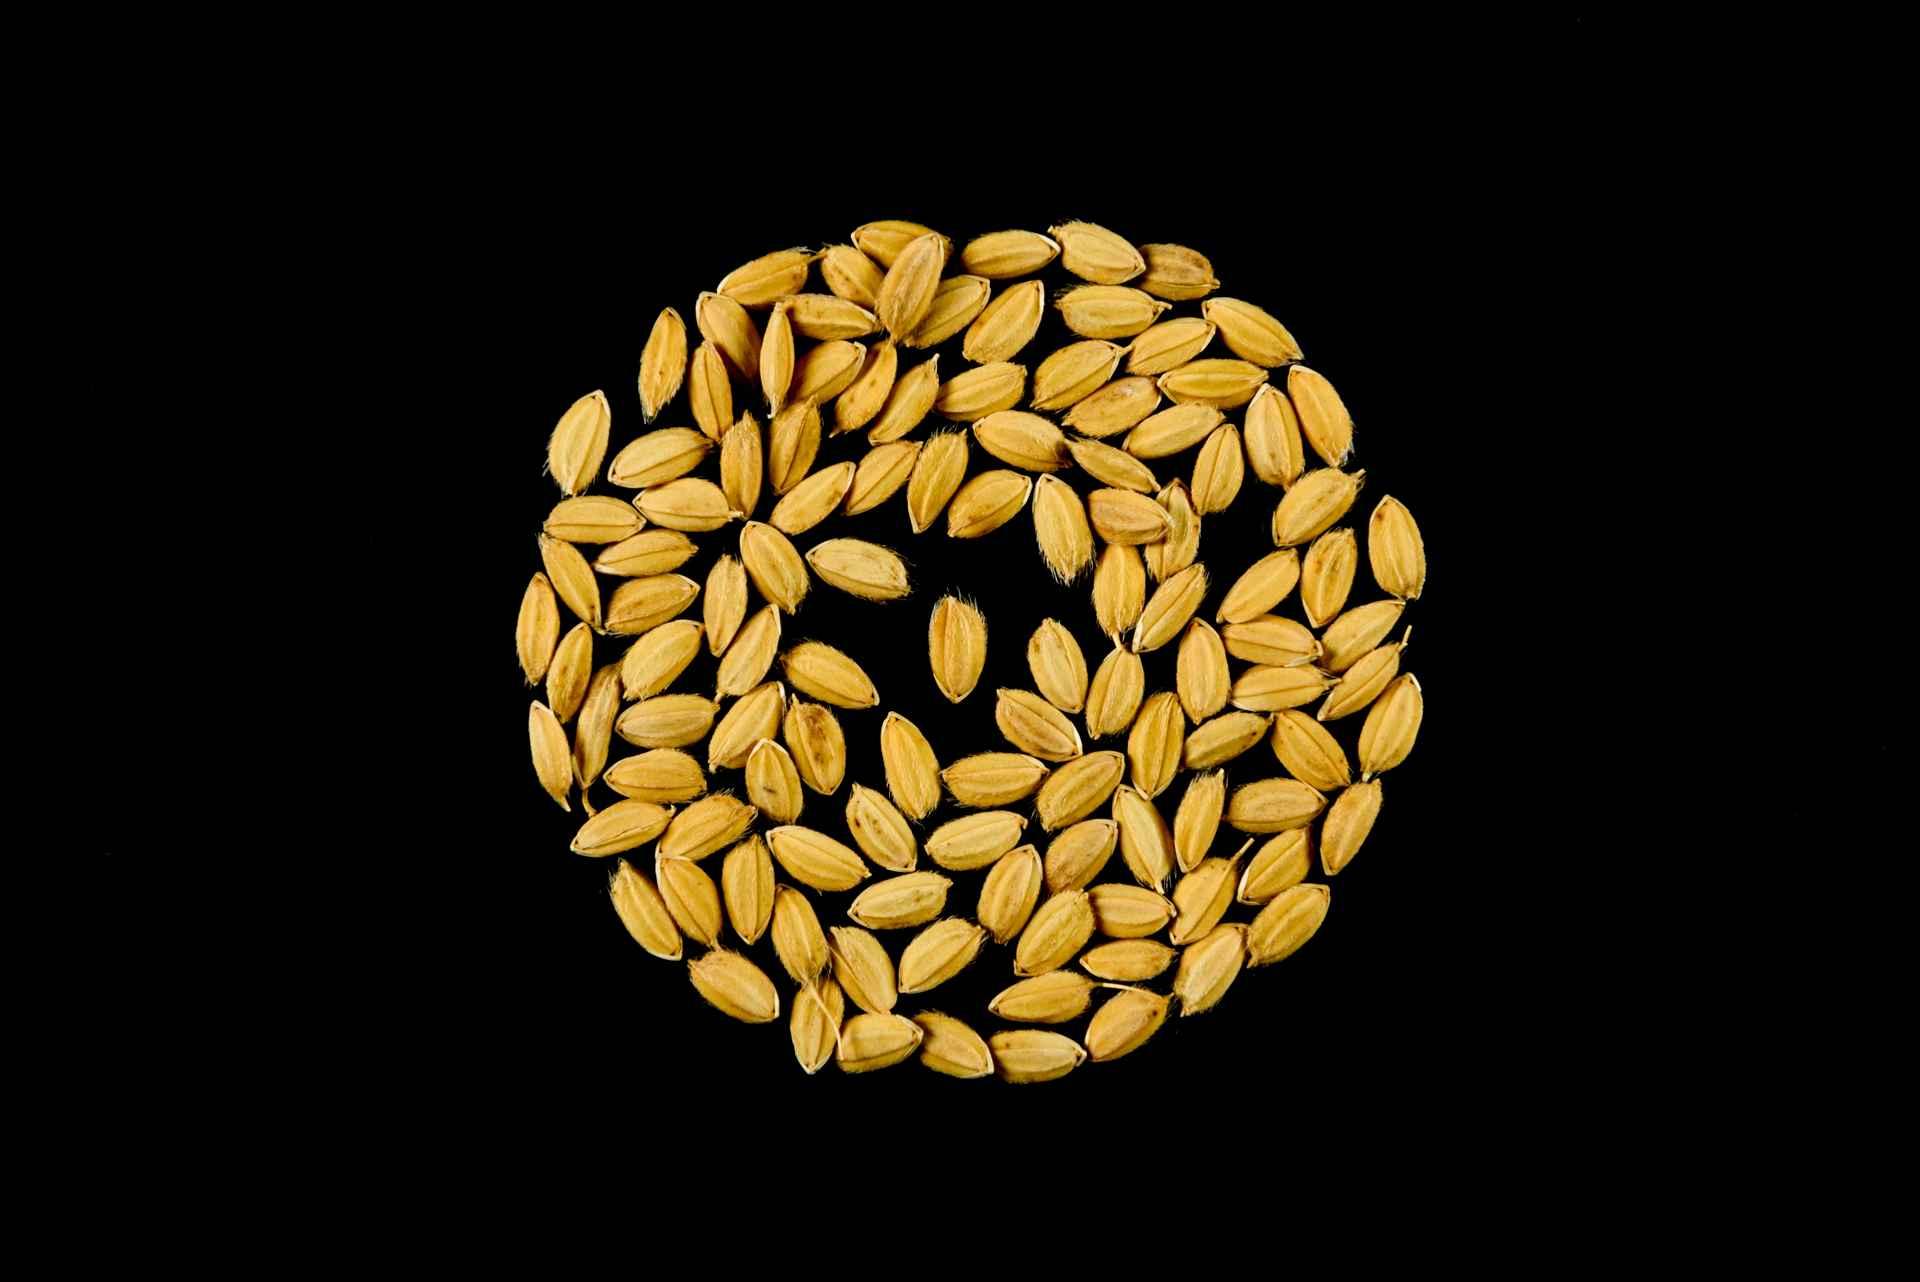 seme di riso sole cl risone